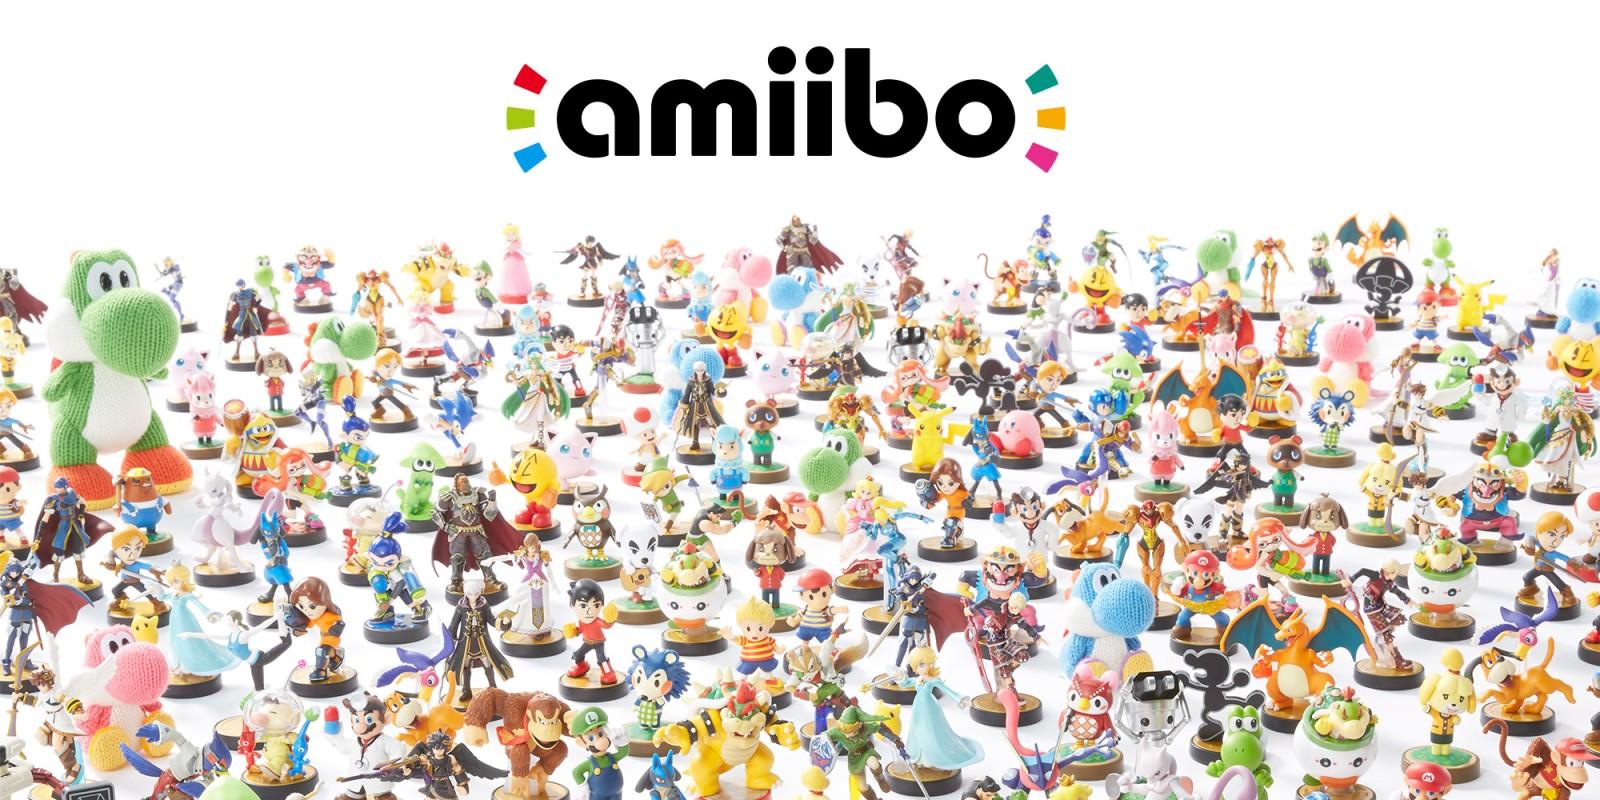 26ef7013a236c À propos d'amiibo | amiibo | Nintendo